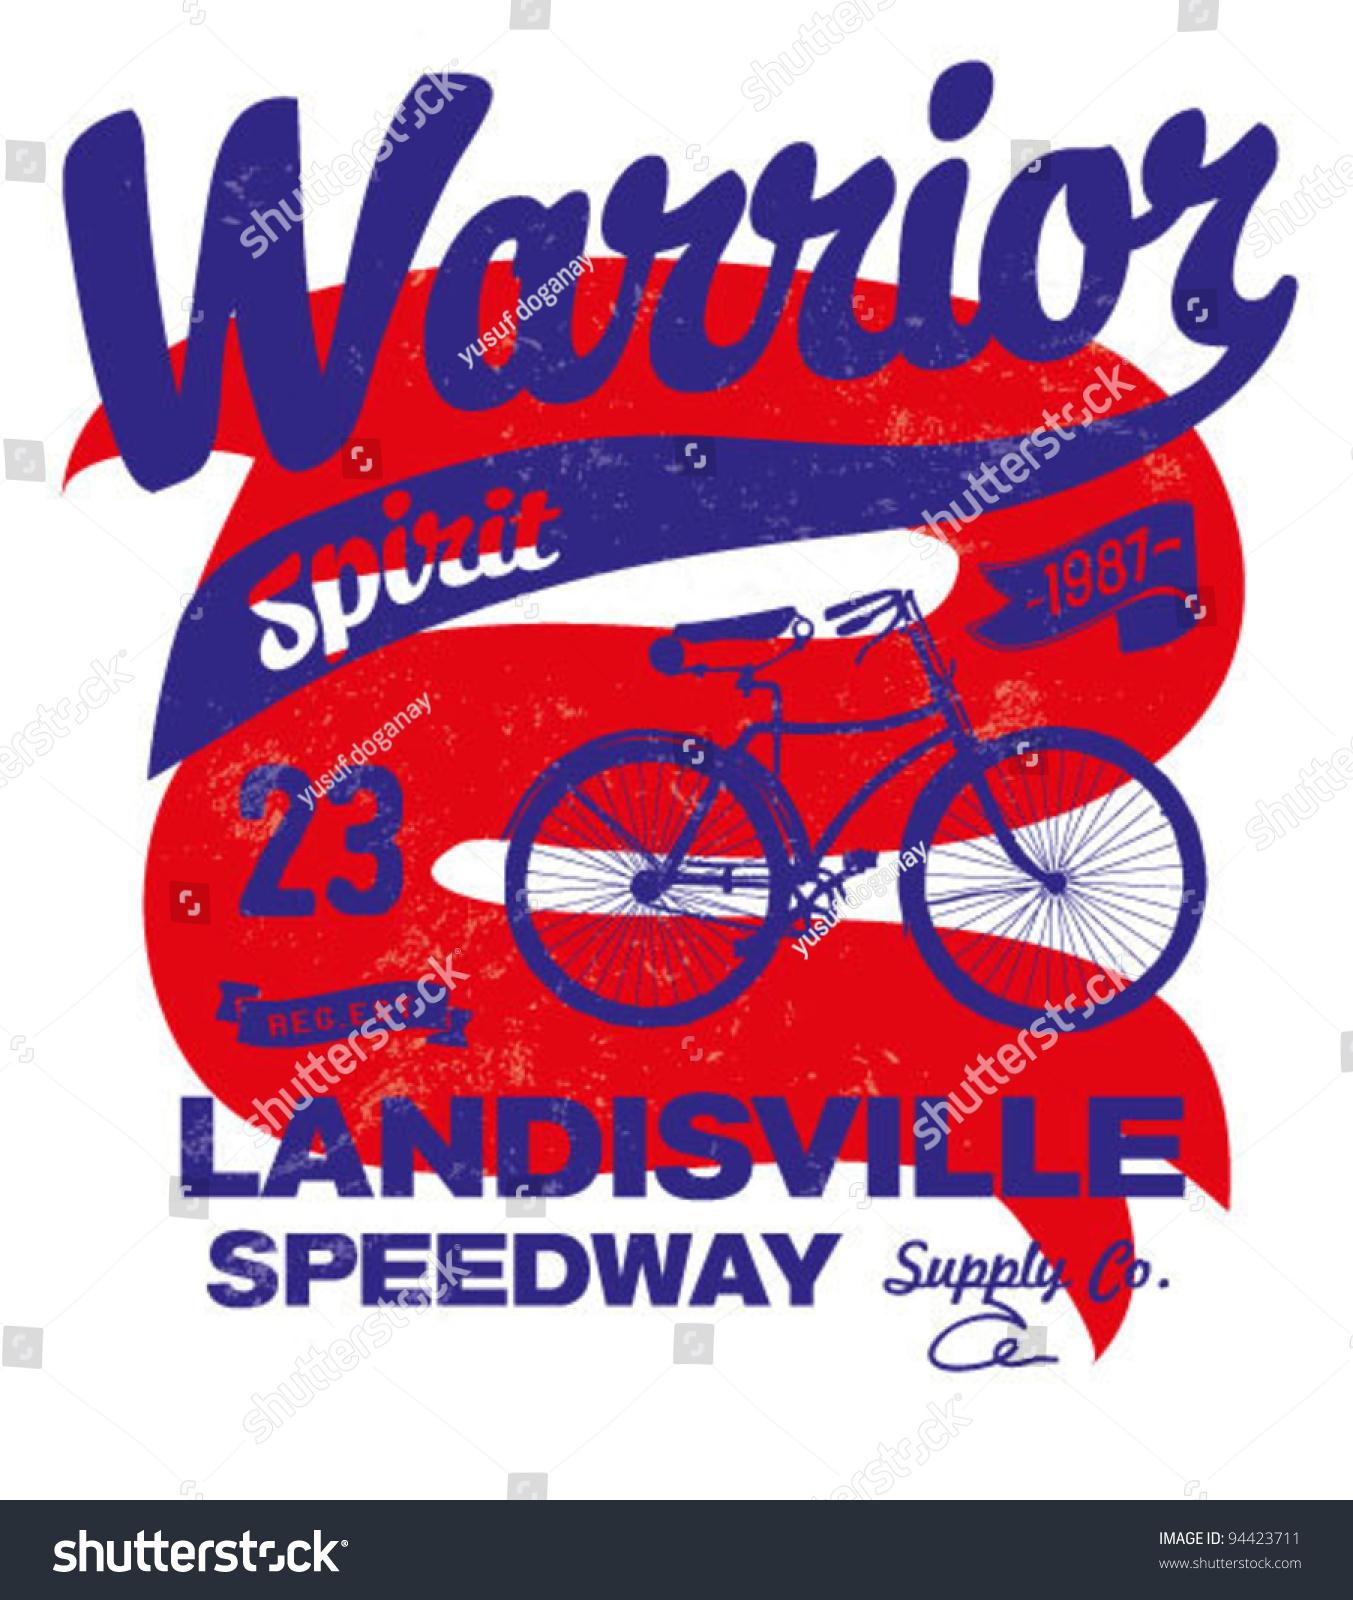 Shirt design printing - T Shirt Design Printing Bicycle Label